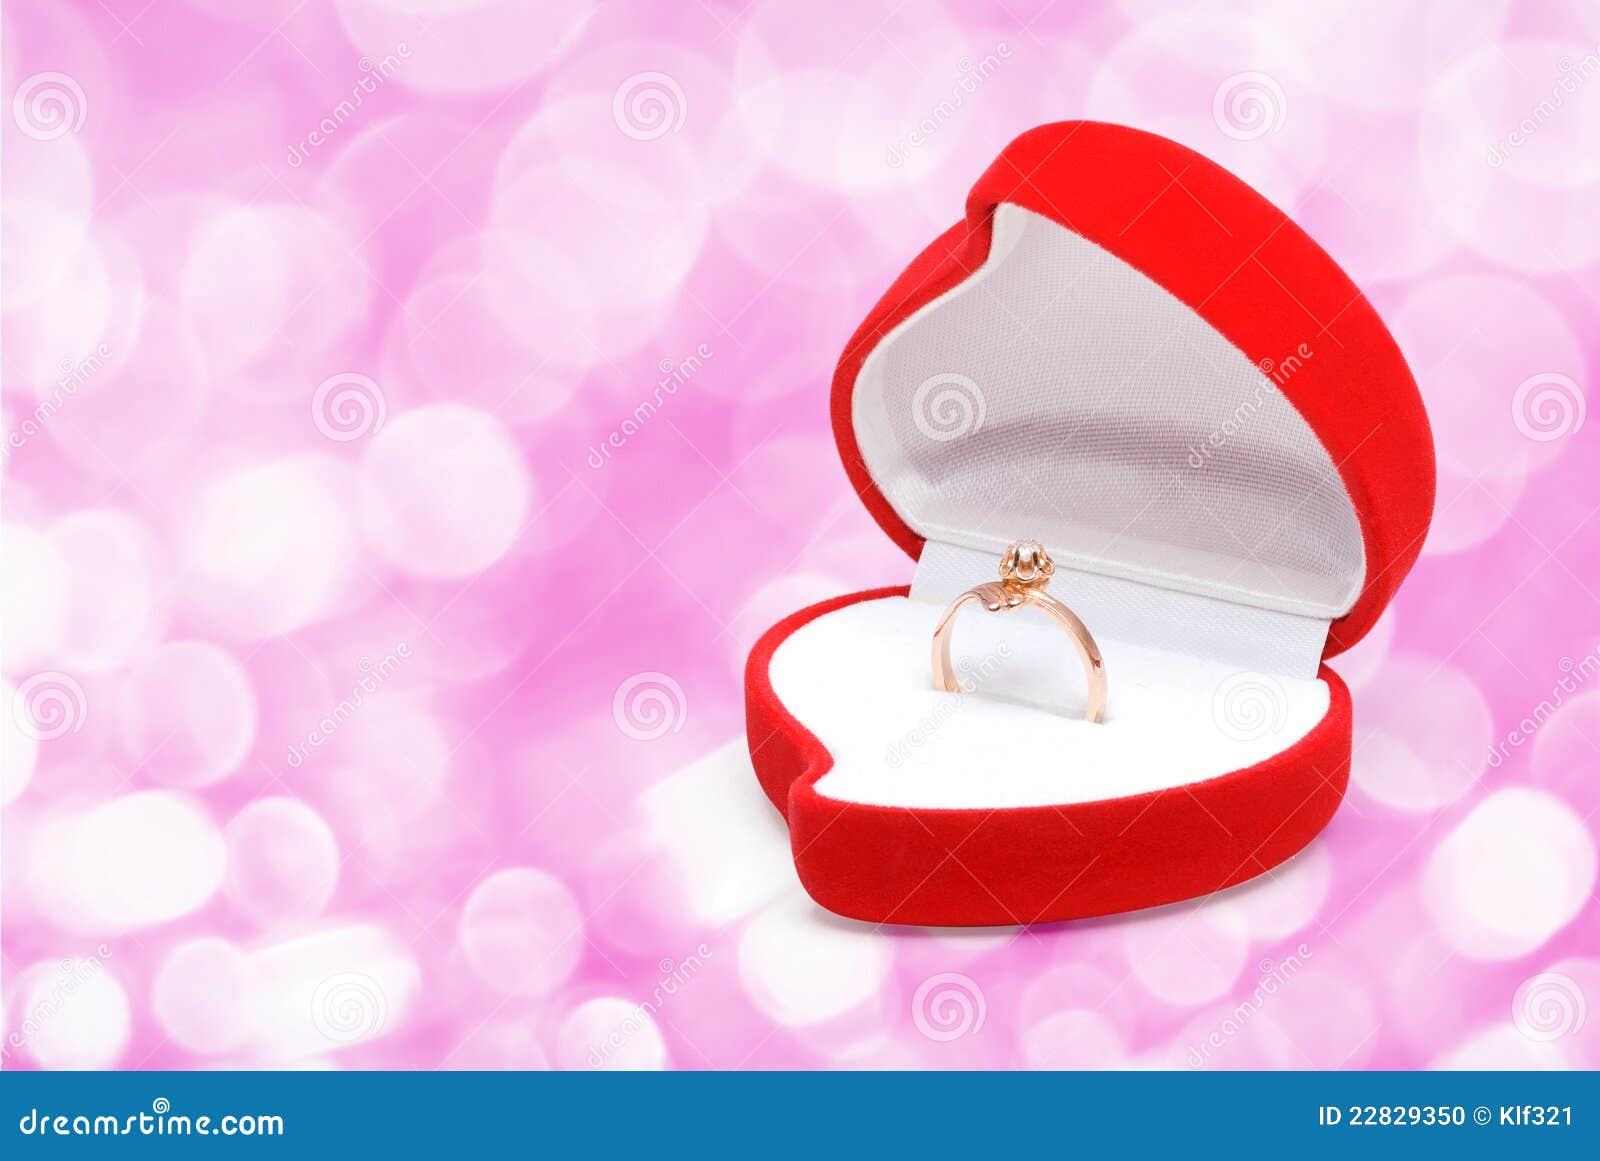 Gold ring in box stock photo. Image of gold, macro, romantic - 22829350